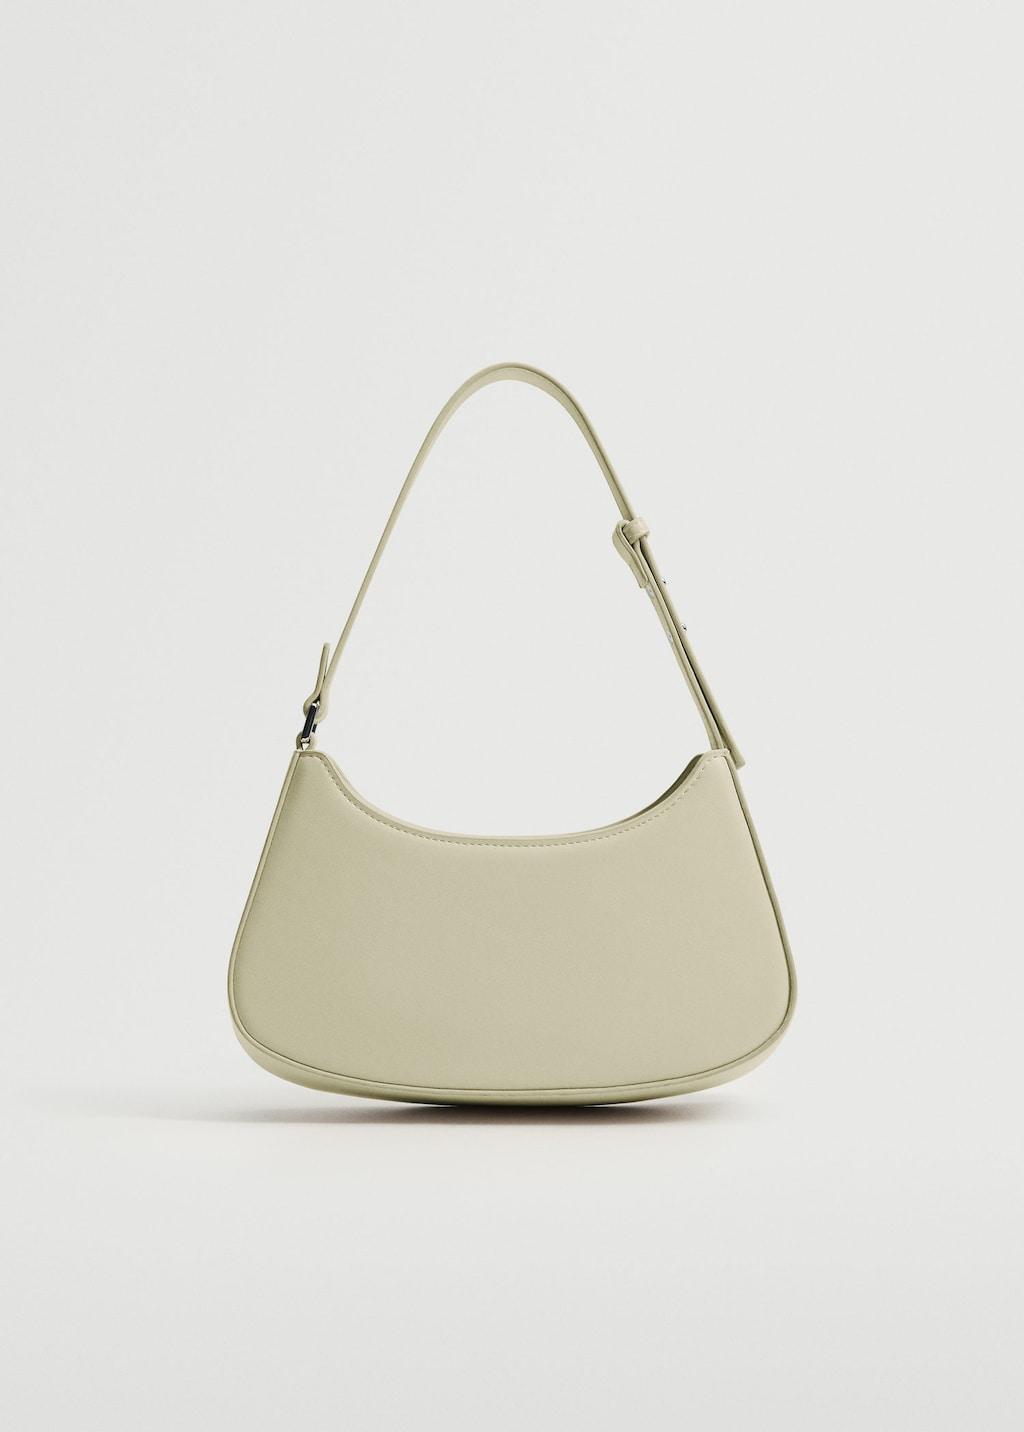 Baguette Bag in Aqua Green for best minimalist purses